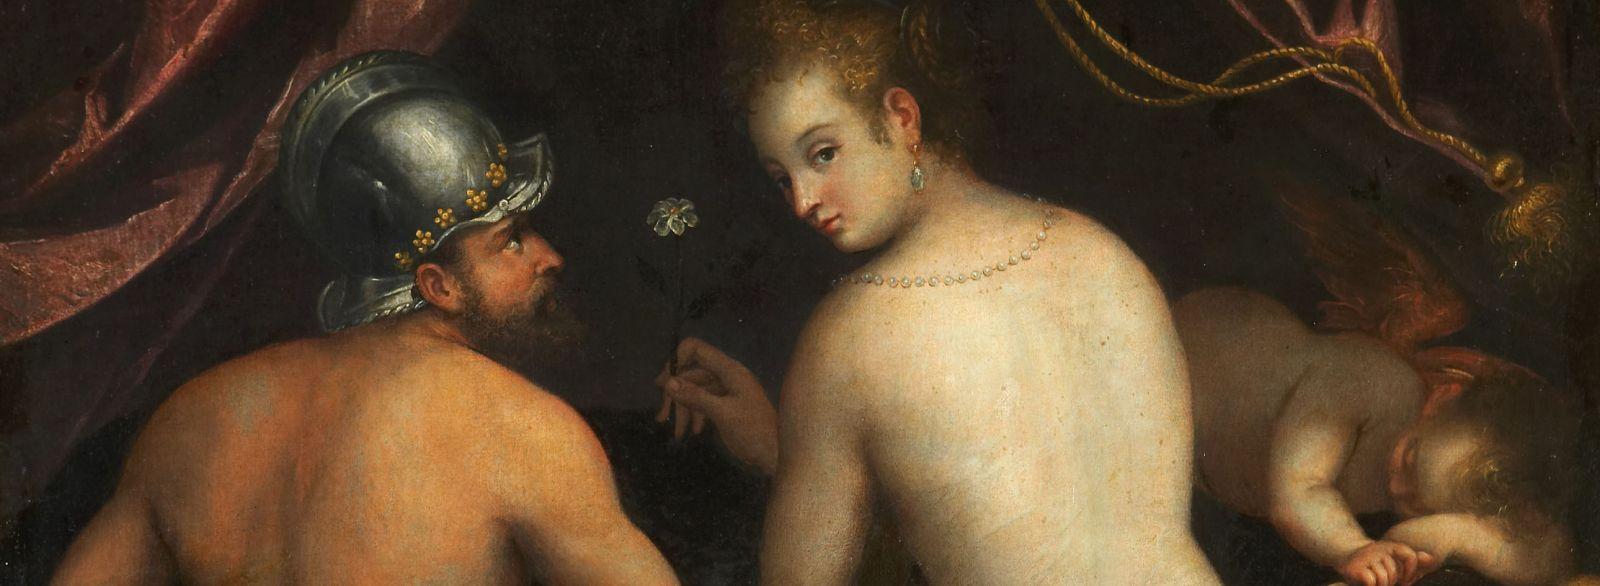 Sofonisba Anguissola & Lavinia Fontana